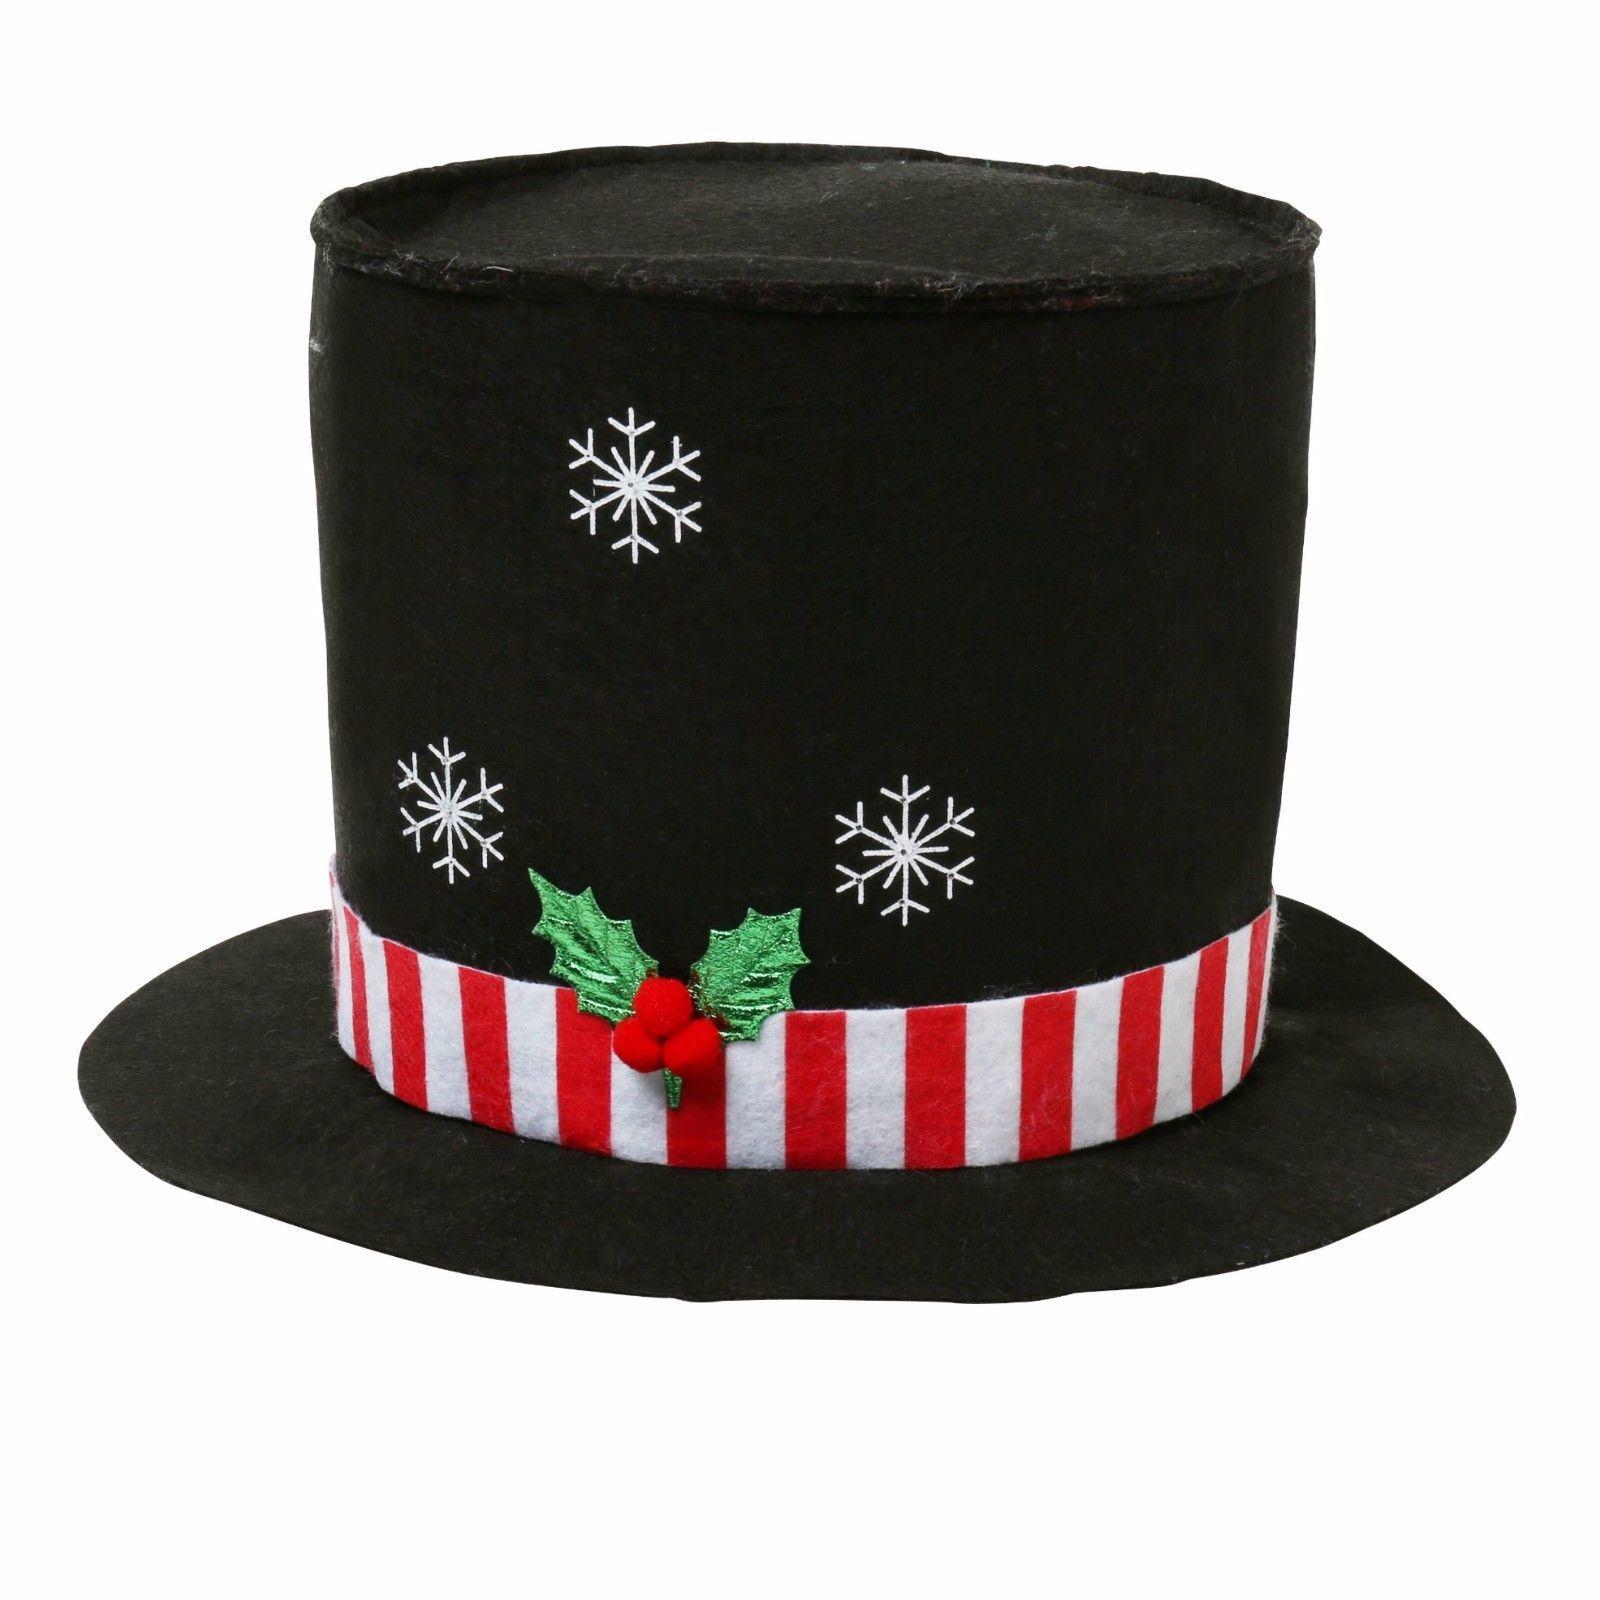 Christmas hats new mens womens unisex xmas novelty festive